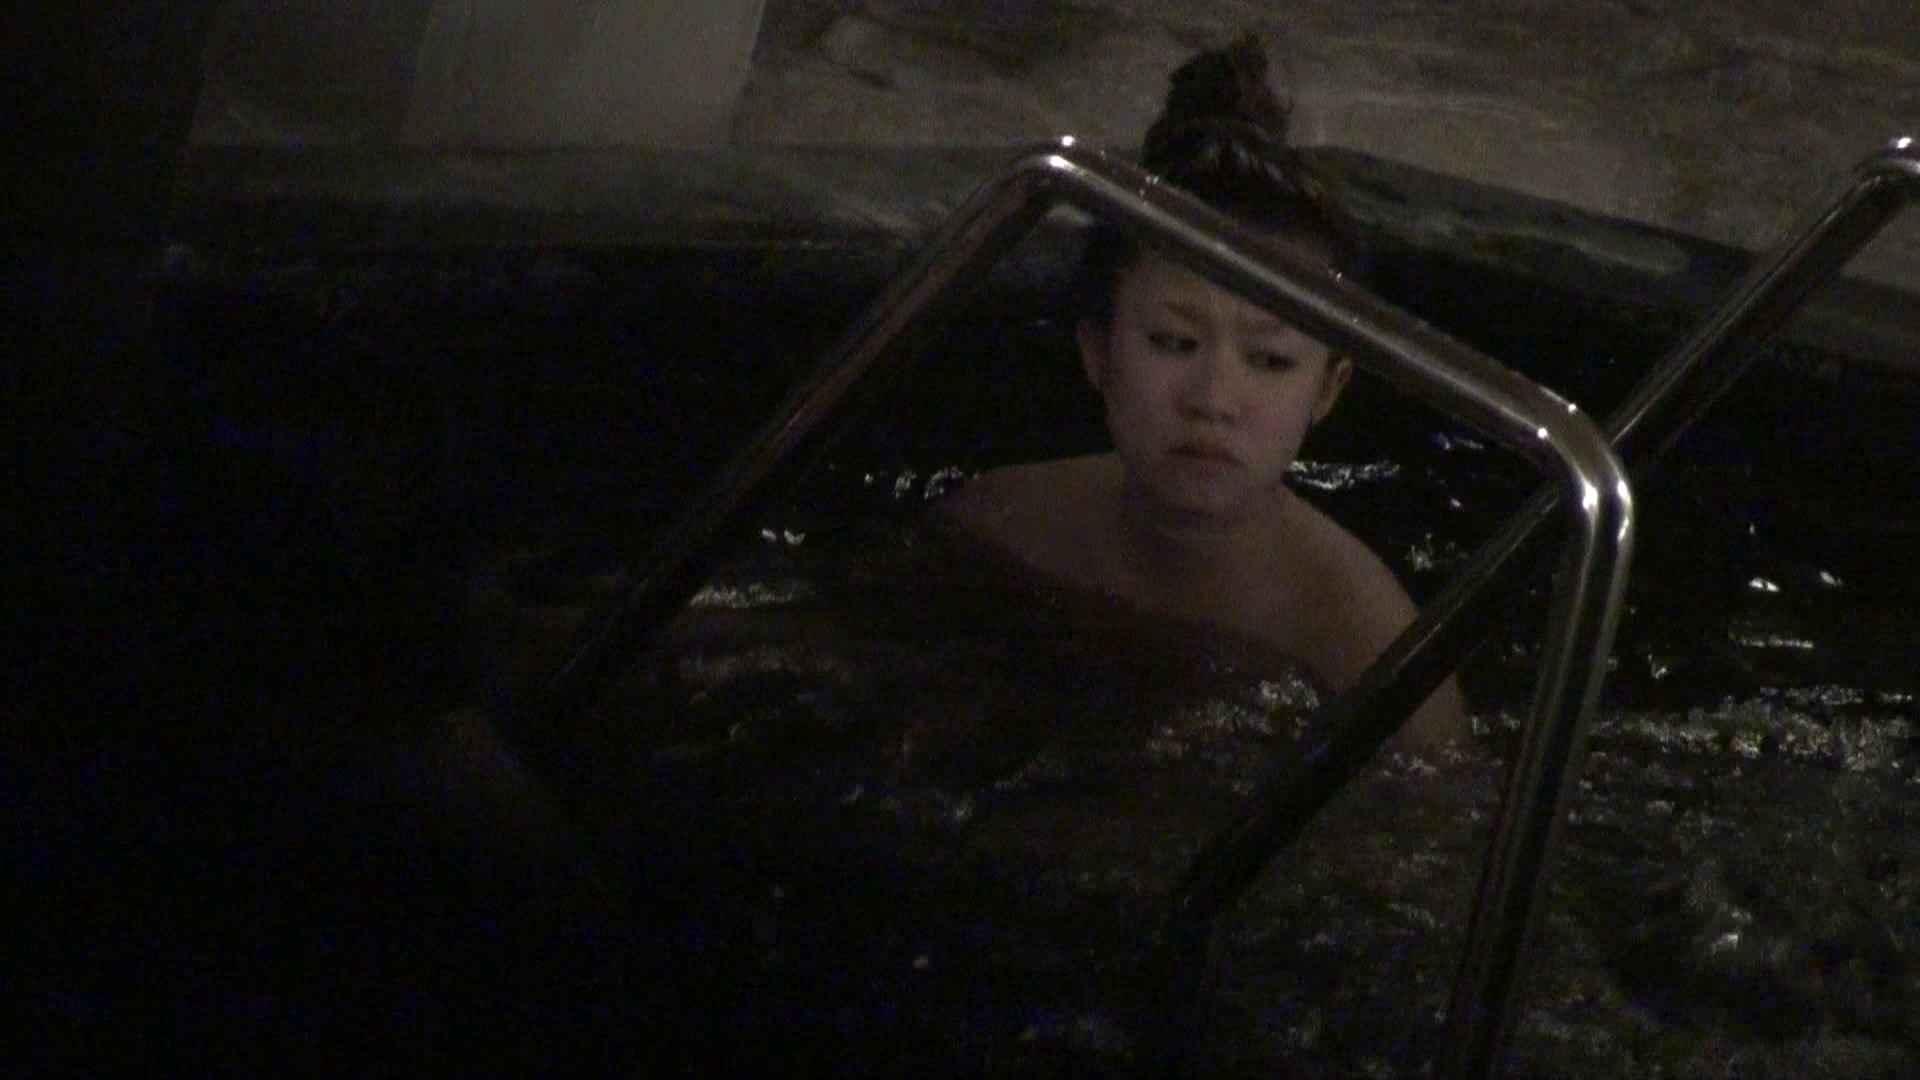 Aquaな露天風呂Vol.378 0  88連発 60